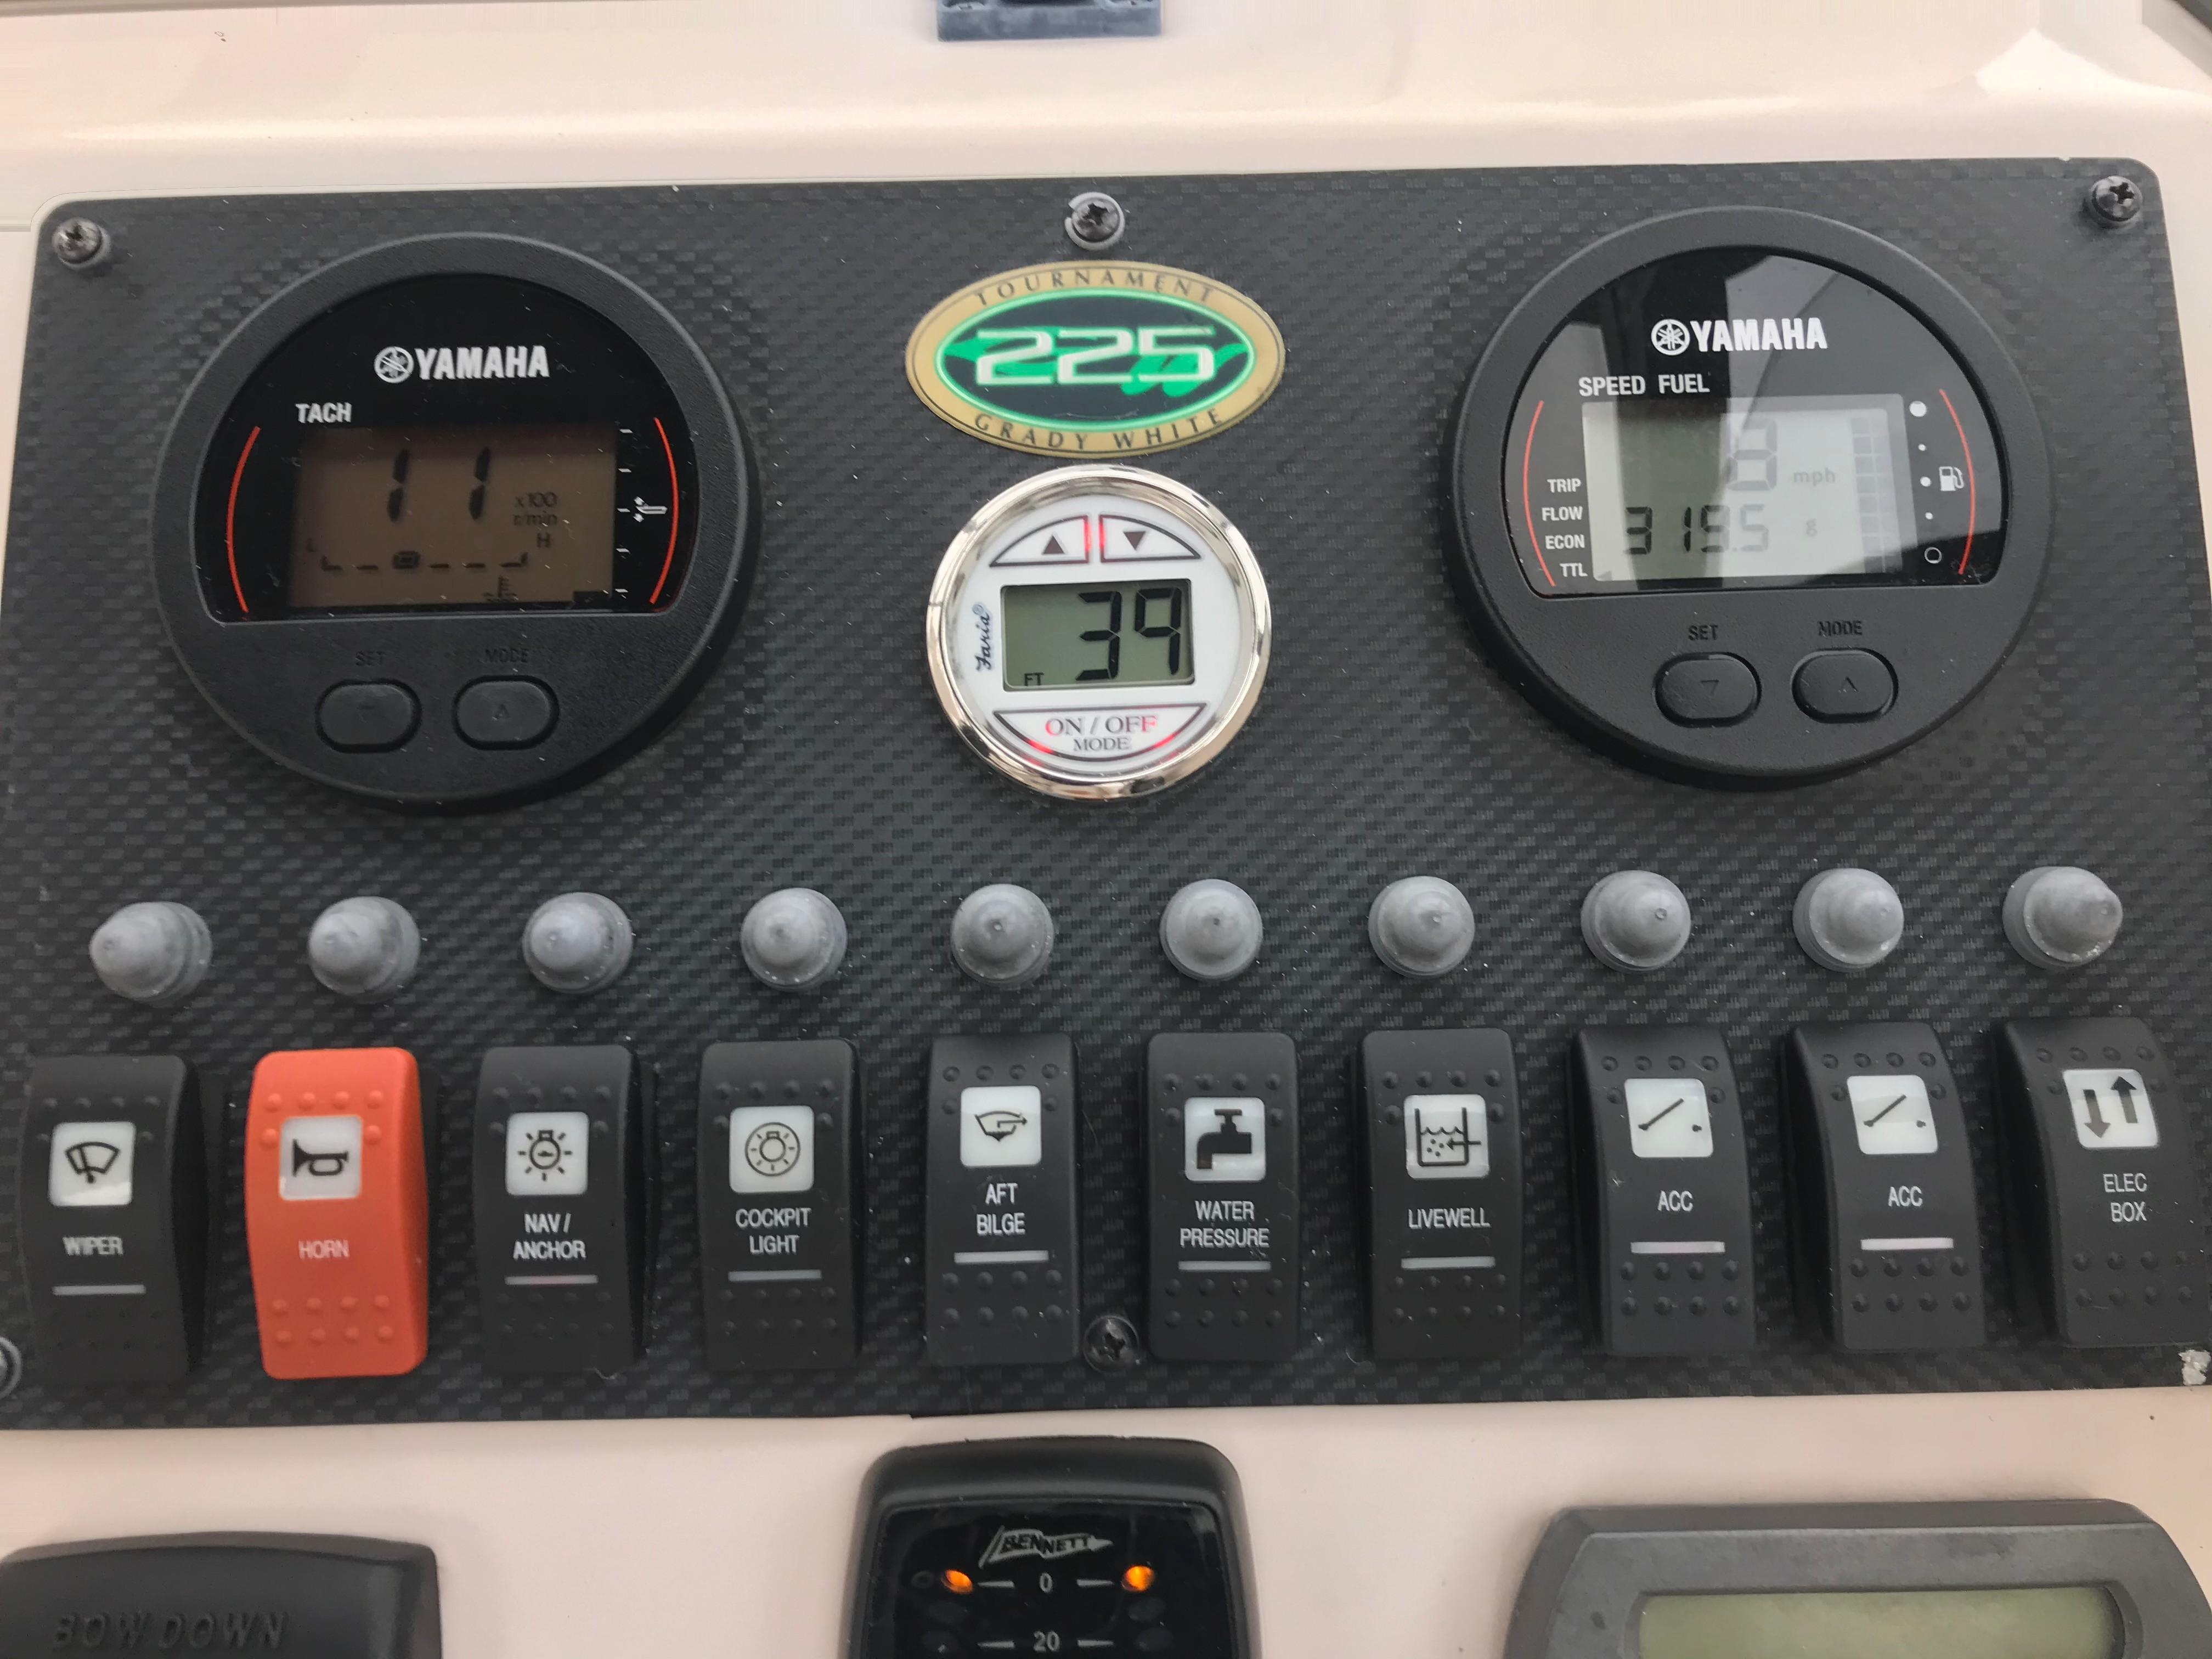 Grady-white 225 Tournament Dual Console - Dash/gauges/switches